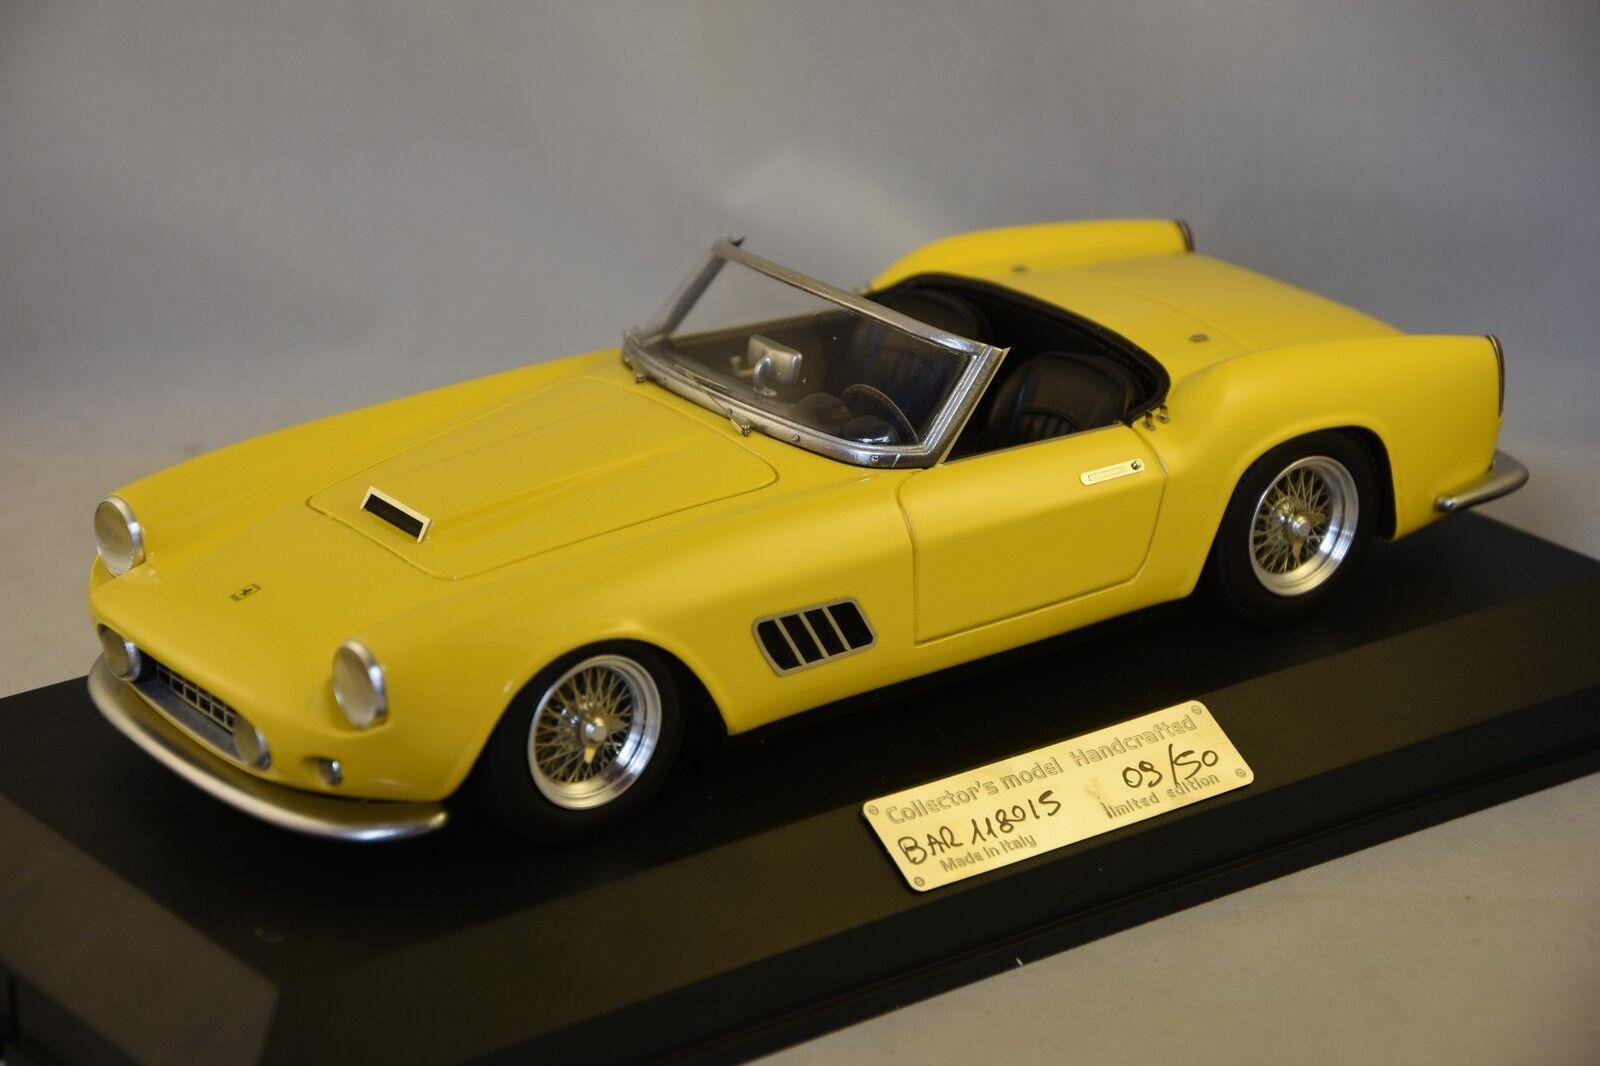 MG MODEL BER118015 - Ferrari 250 GT LWB spyder barchetta 118015 route amarillo 1 18